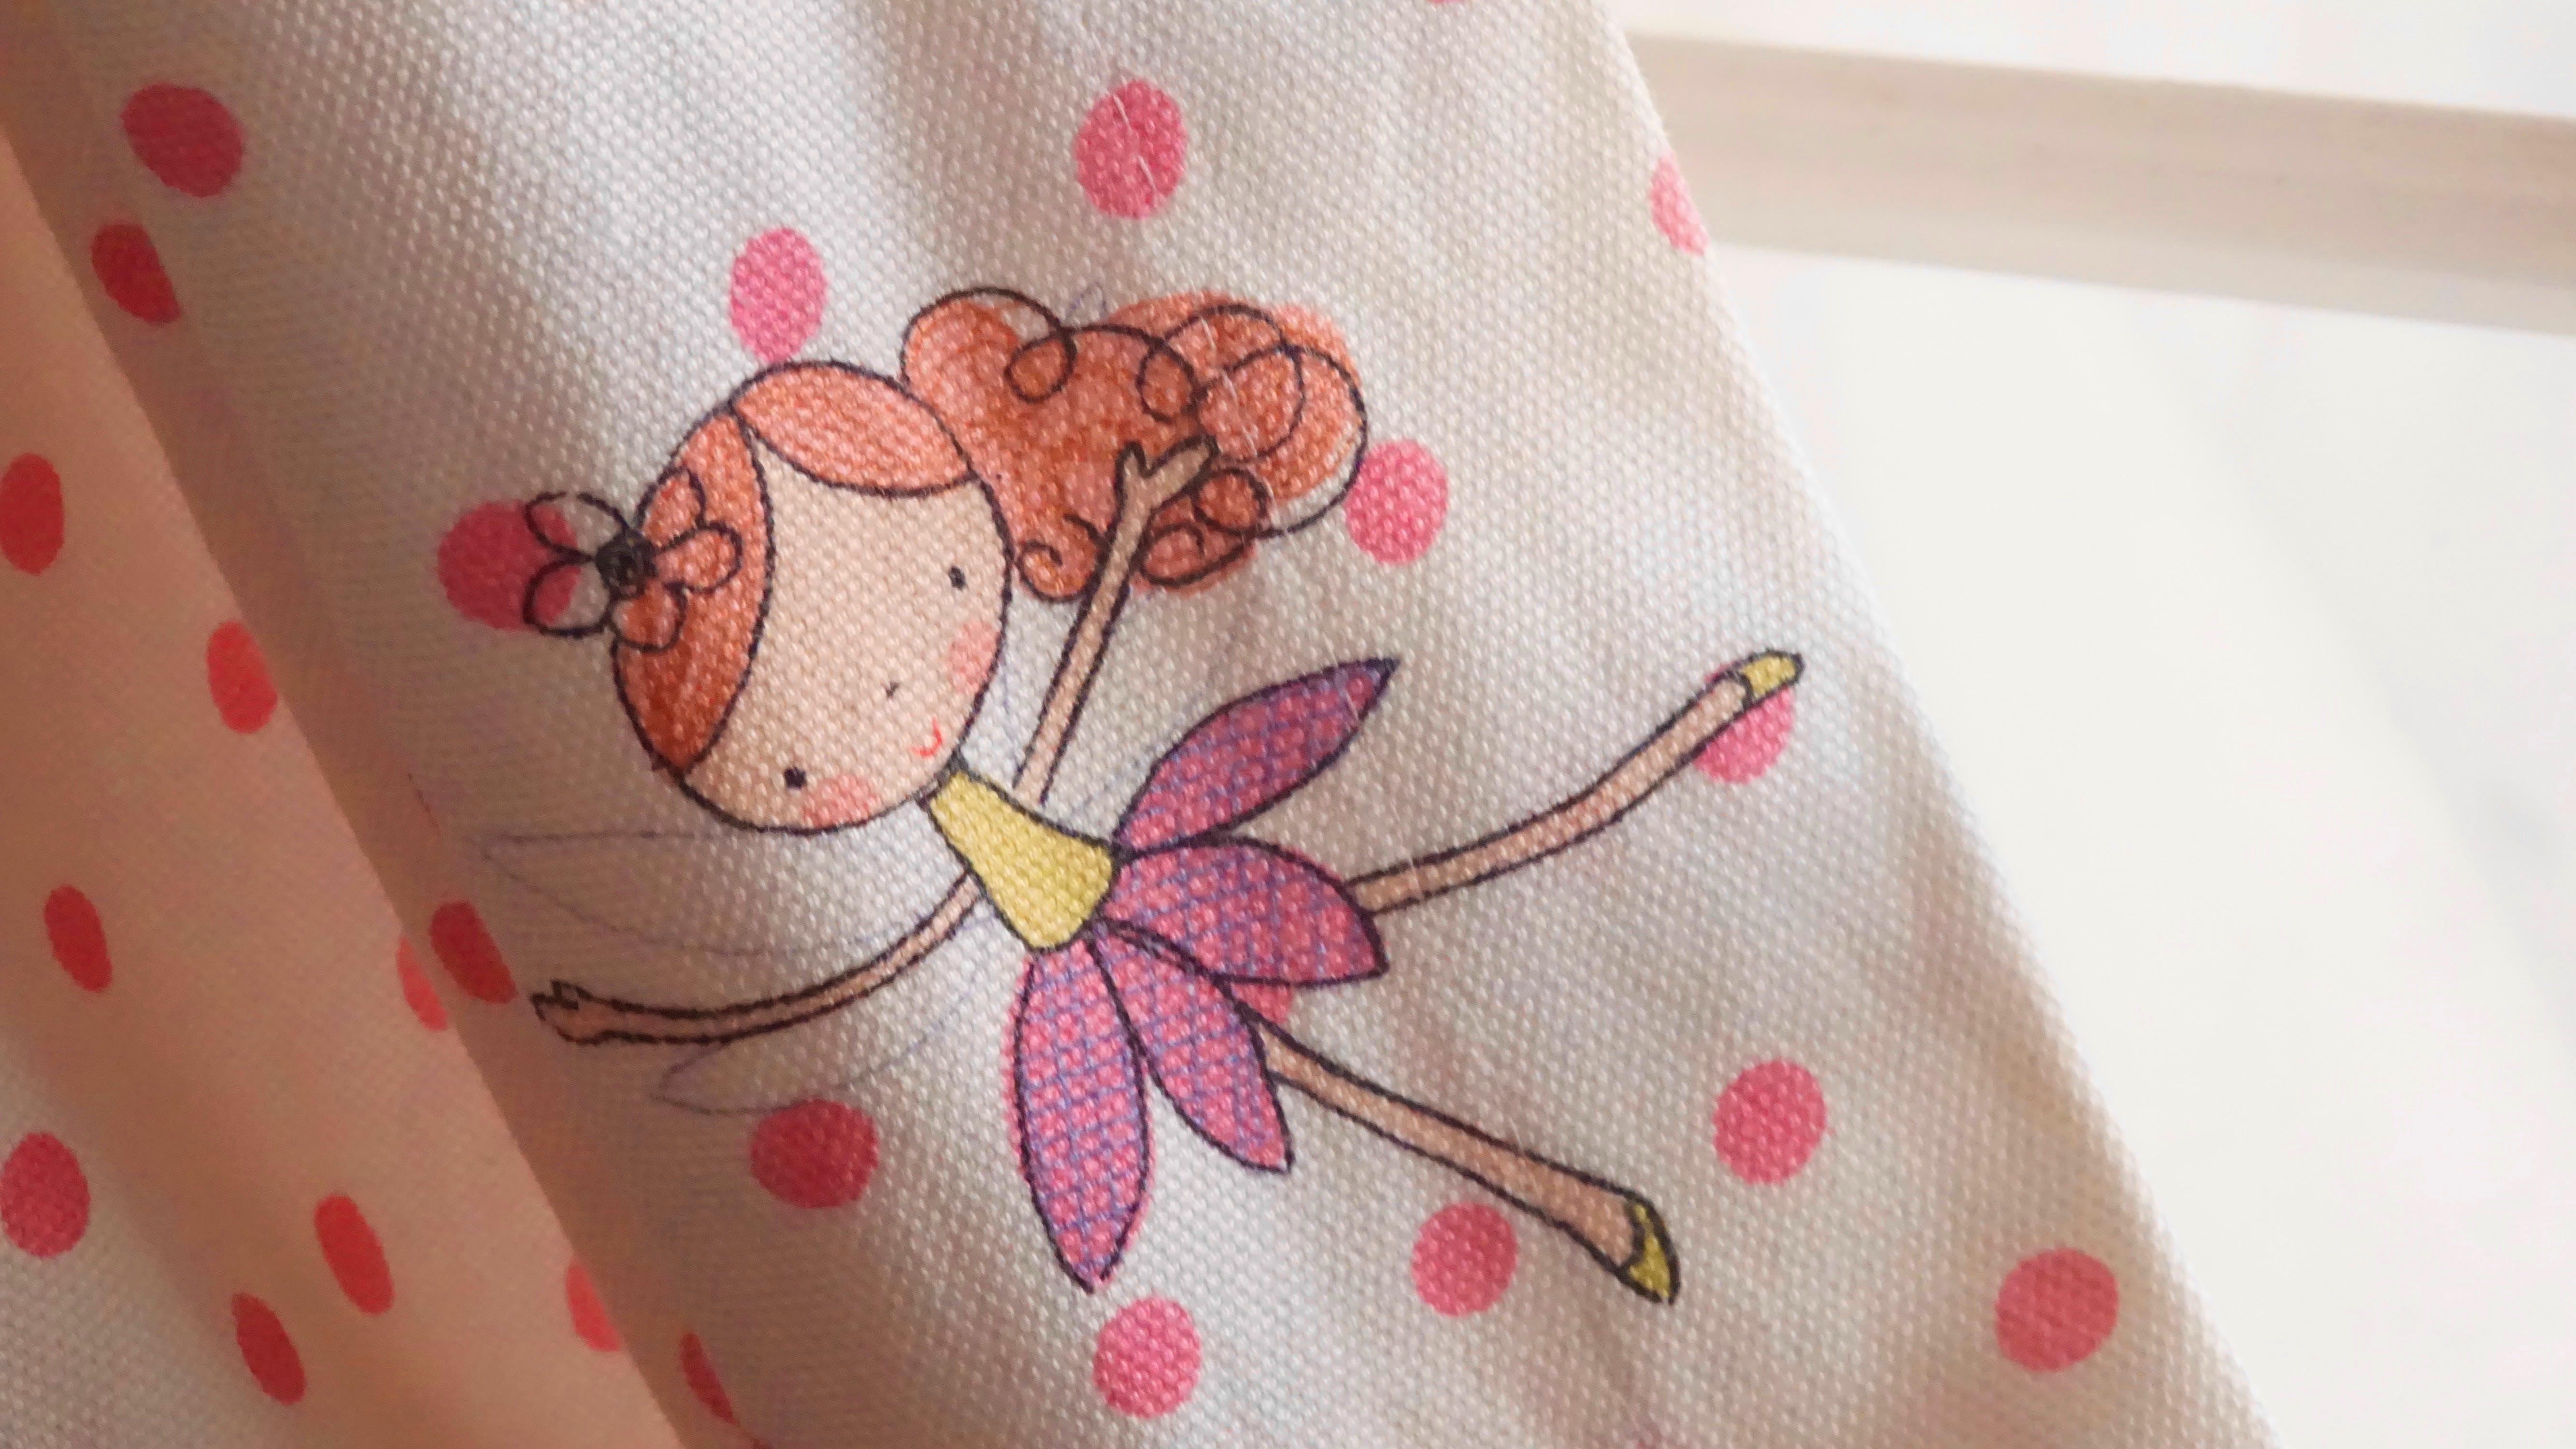 Free stock photo of cartoon, childhood, children's room, curtain